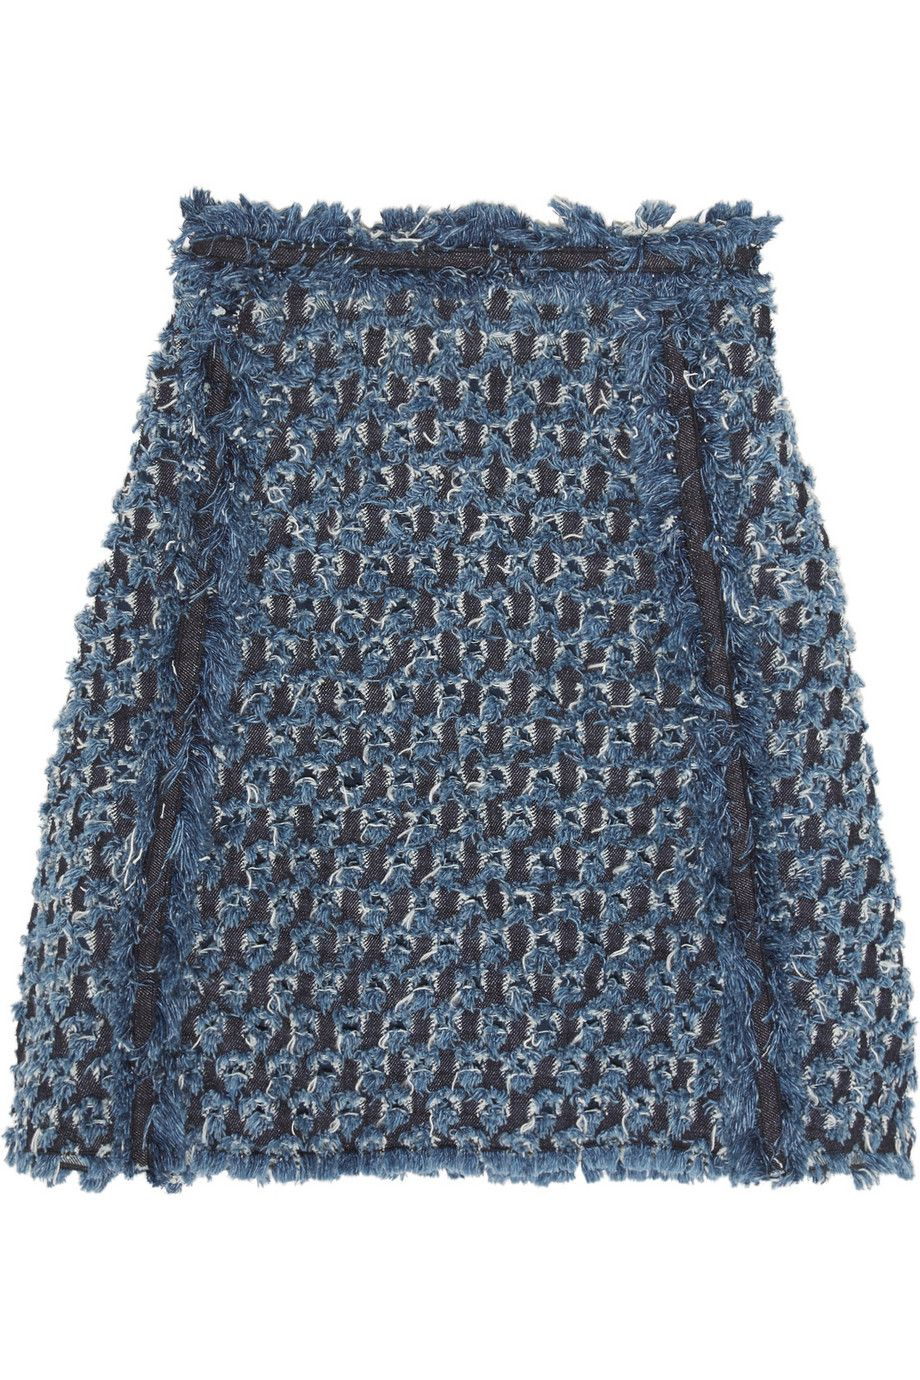 Sonia Rykiel | Frayed Laser-Cut Denim Mini Skirt | https://www.net-a-porter.com/gb/en/product/685185/sonia_rykiel/frayed-laser-cut-denim-mini-skirt